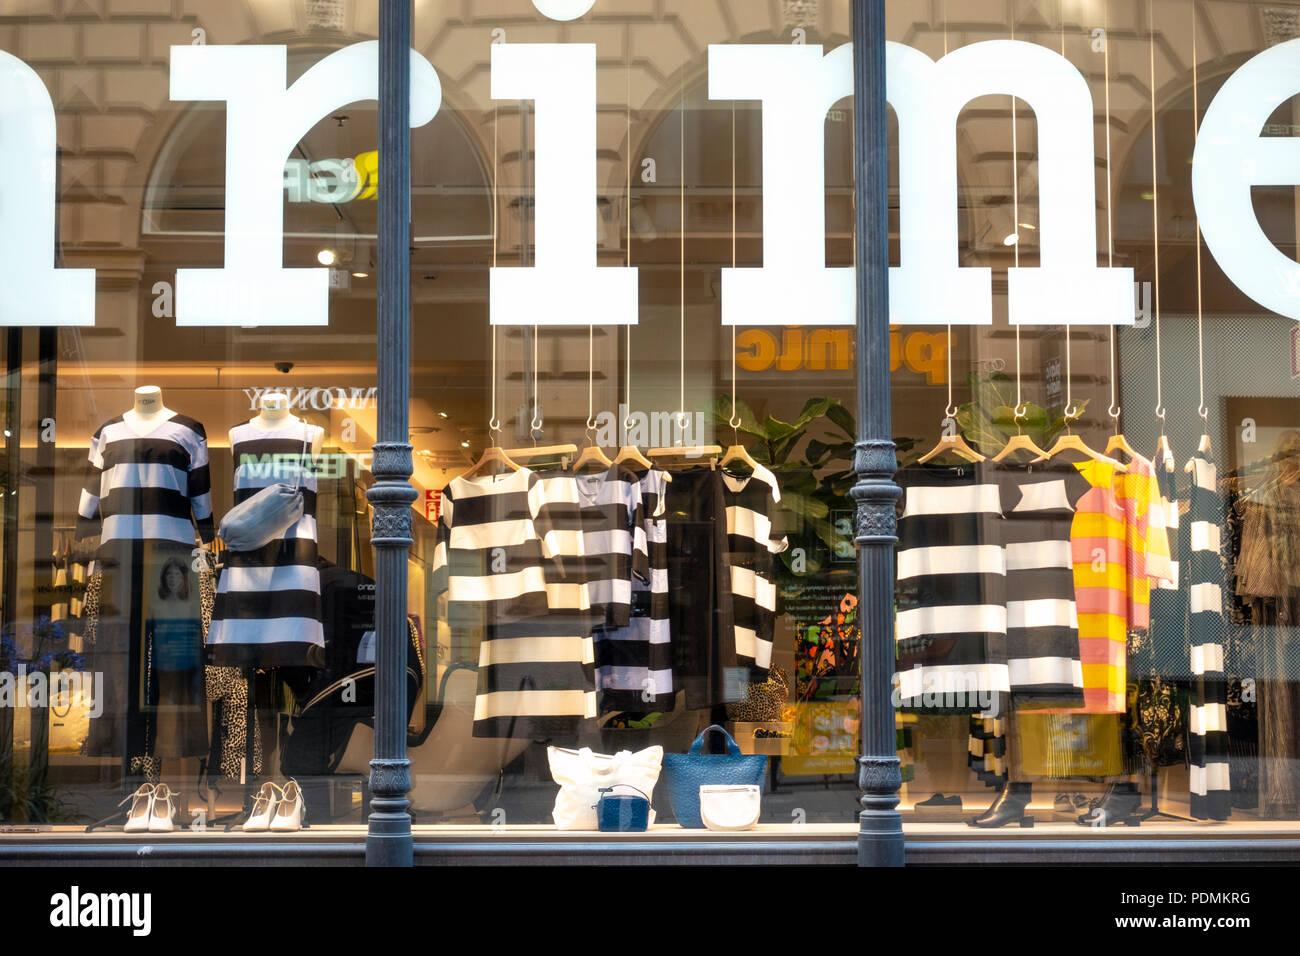 https://c7.alamy.com/comp/PDMKRG/marimekko-fashion-store-in-mikonkatu-mikaelsgatan-street-in-helsinki-finland-PDMKRG.jpg